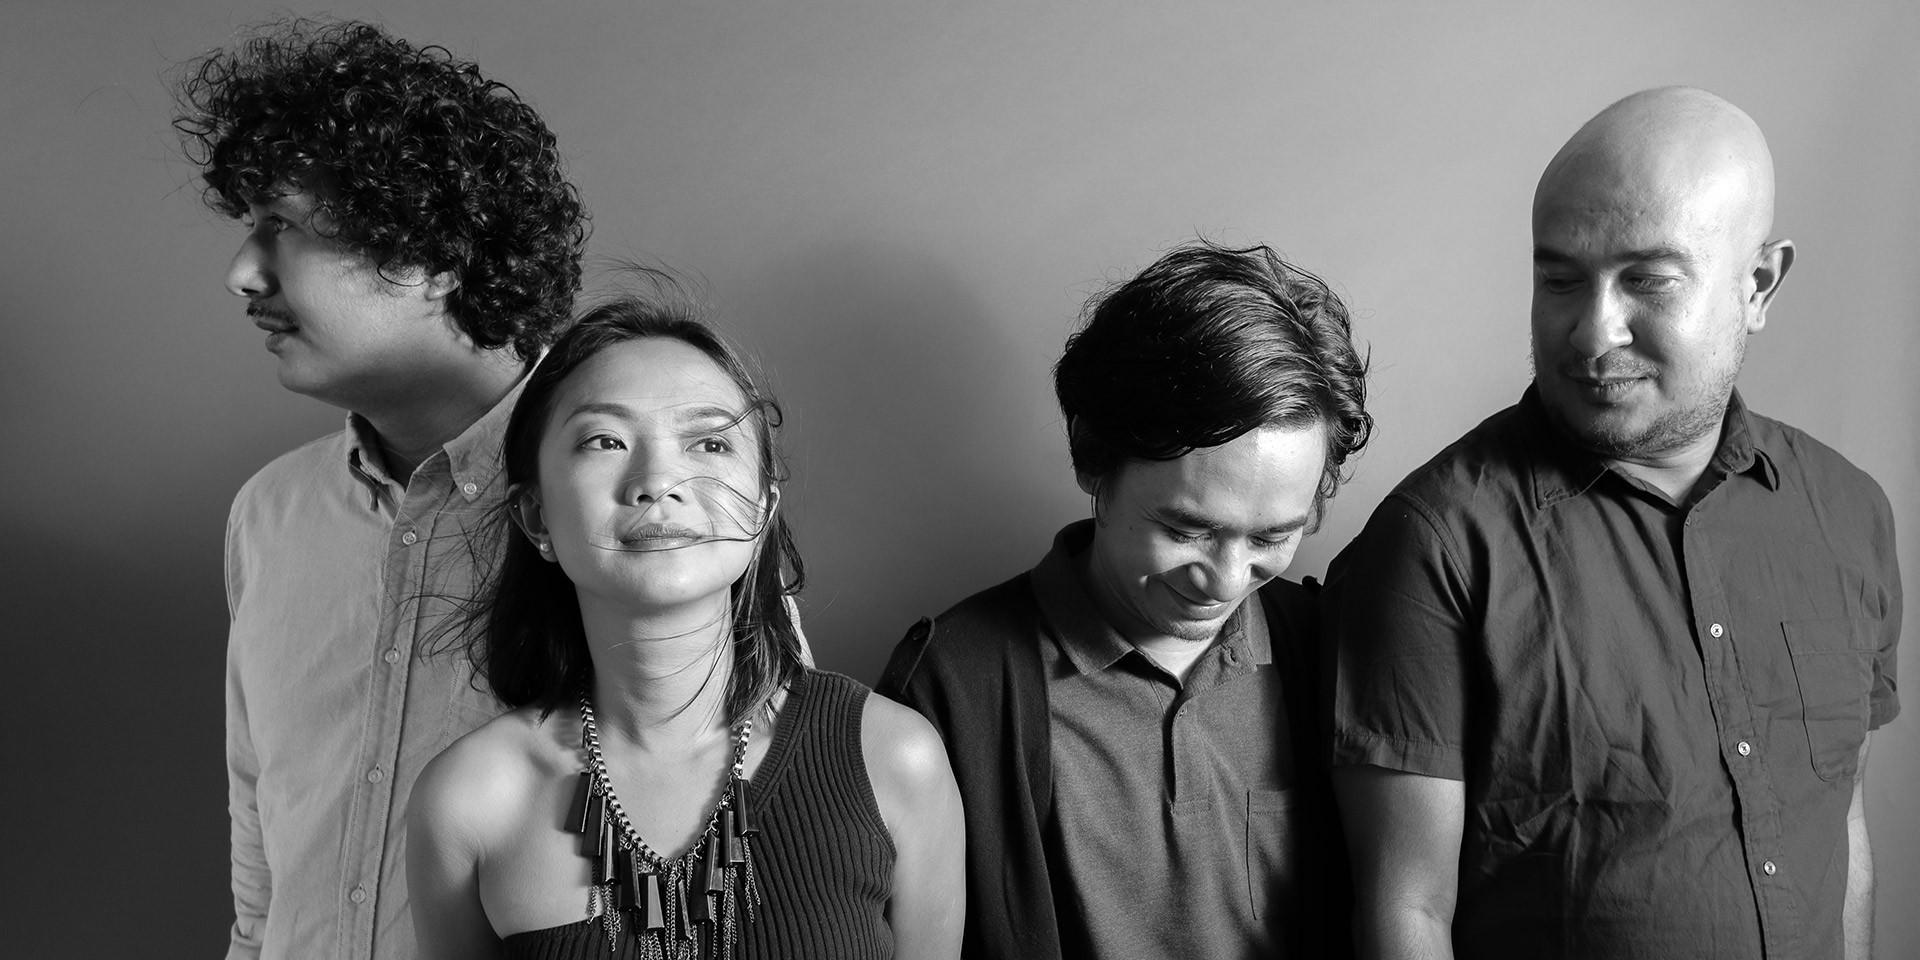 We Are Imaginary drop new single 'Dekada' from upcoming album – listen